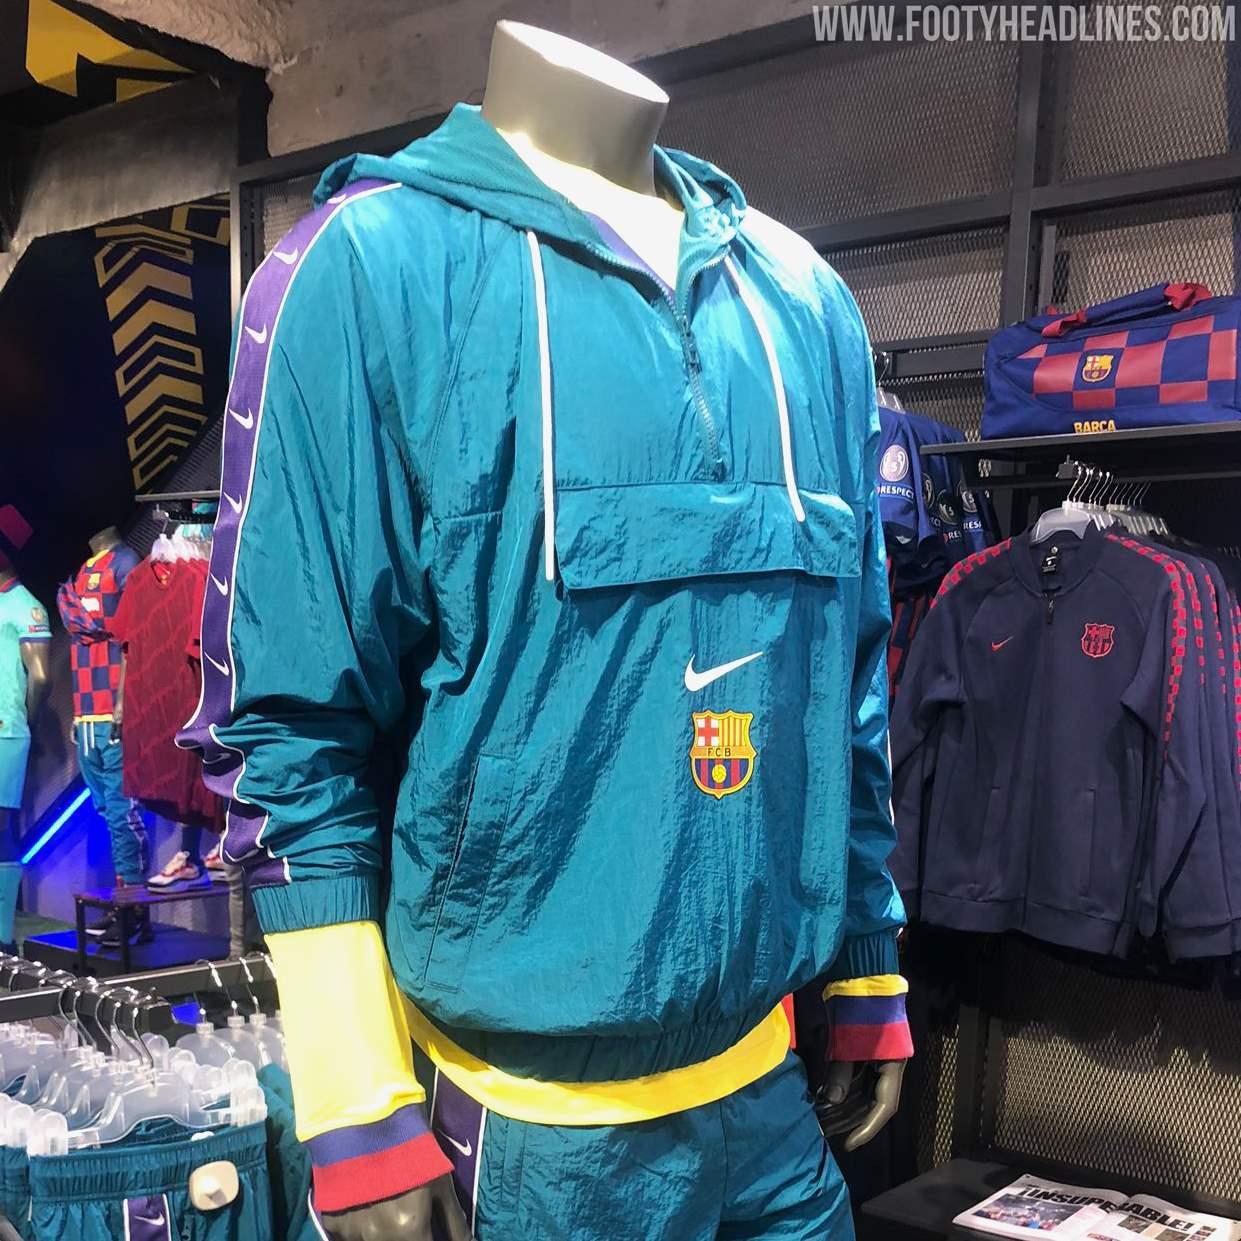 auxiliar Illinois Matón  Amazing Nike Barcelona 19-20 Pocket Jacket Released - Footy Headlines